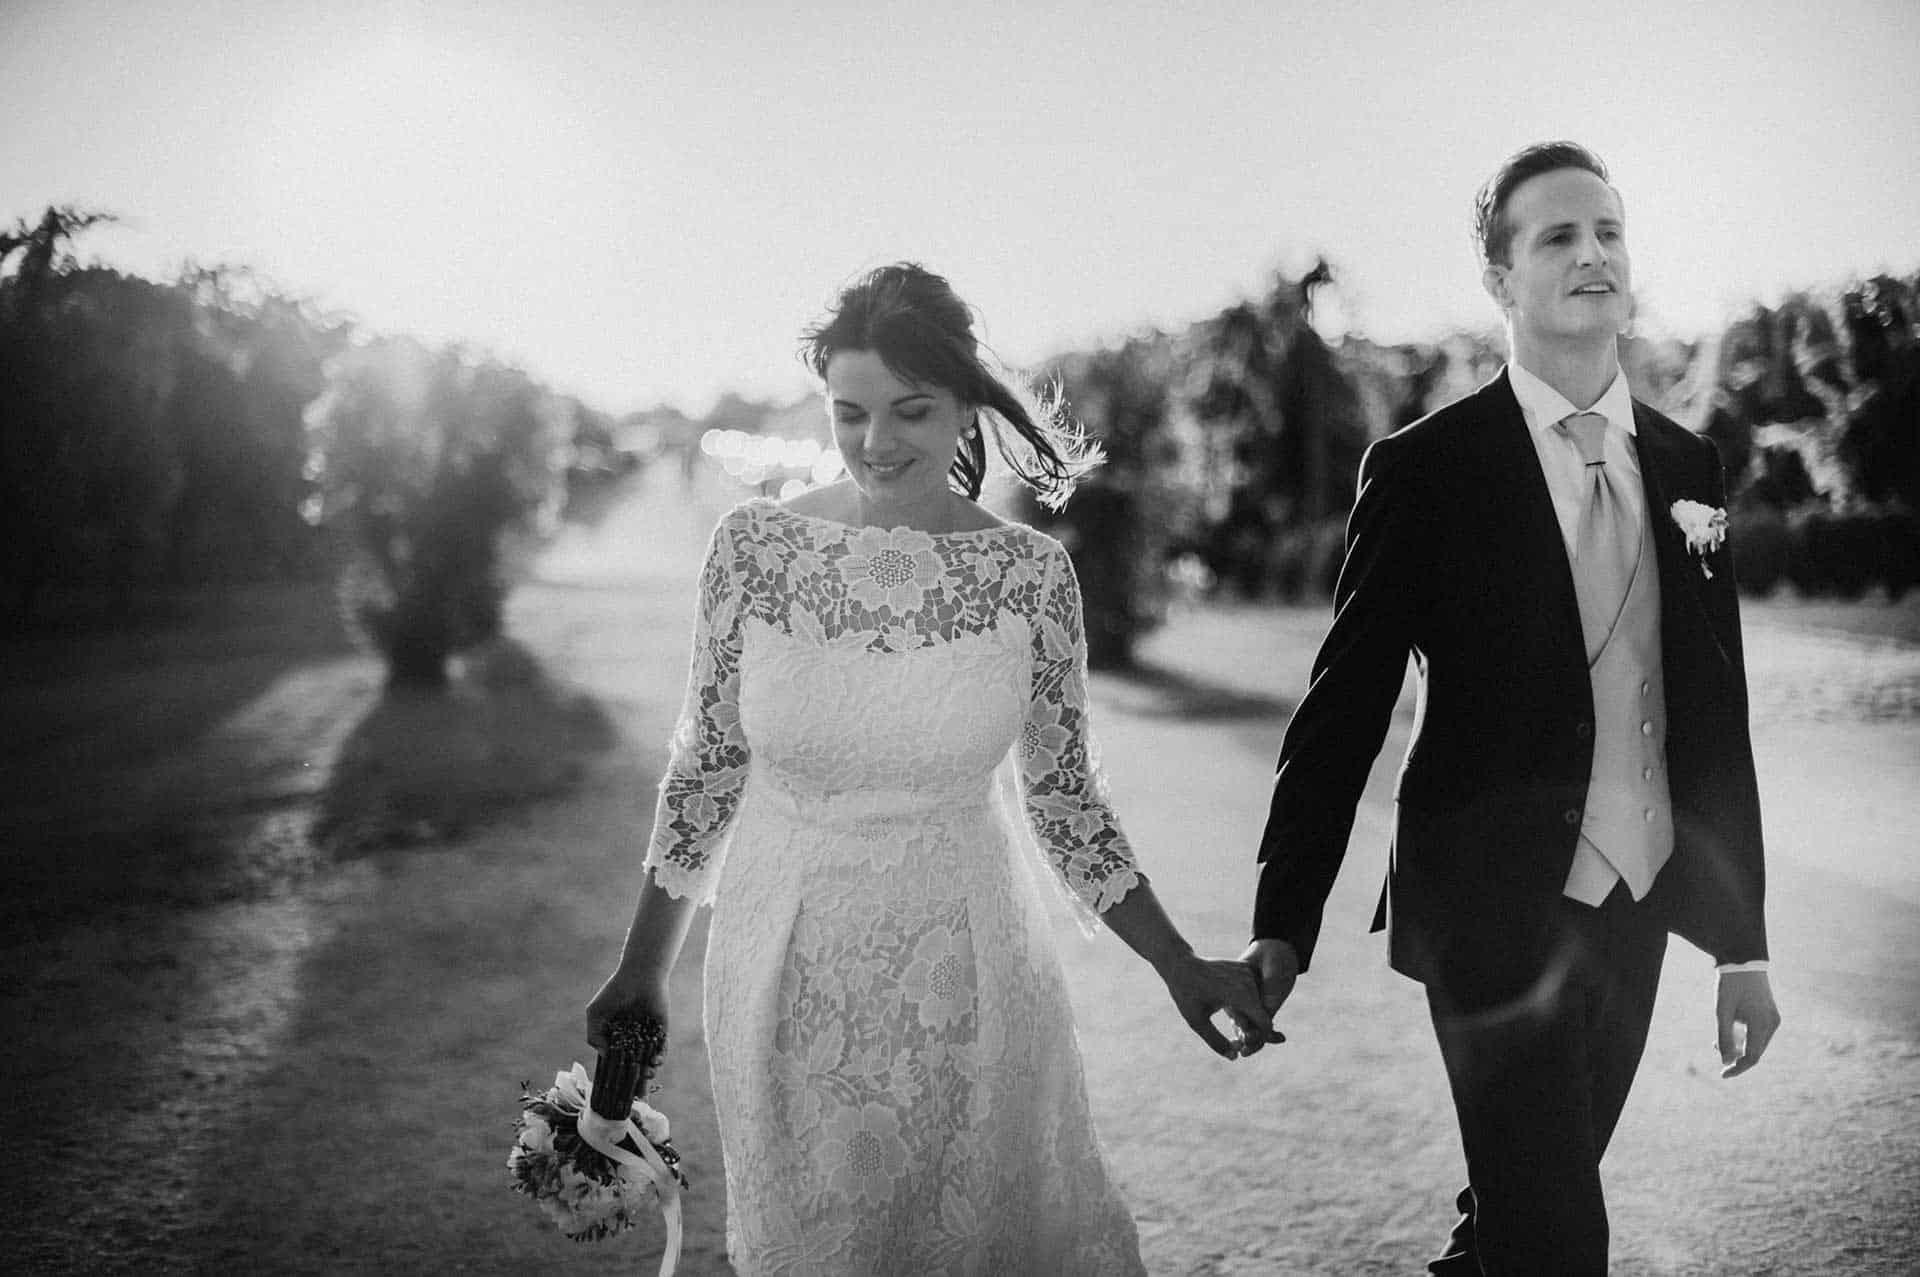 fotografo matrimoni treviso 06 Fotografo Matrimonio Andrea Fusaro